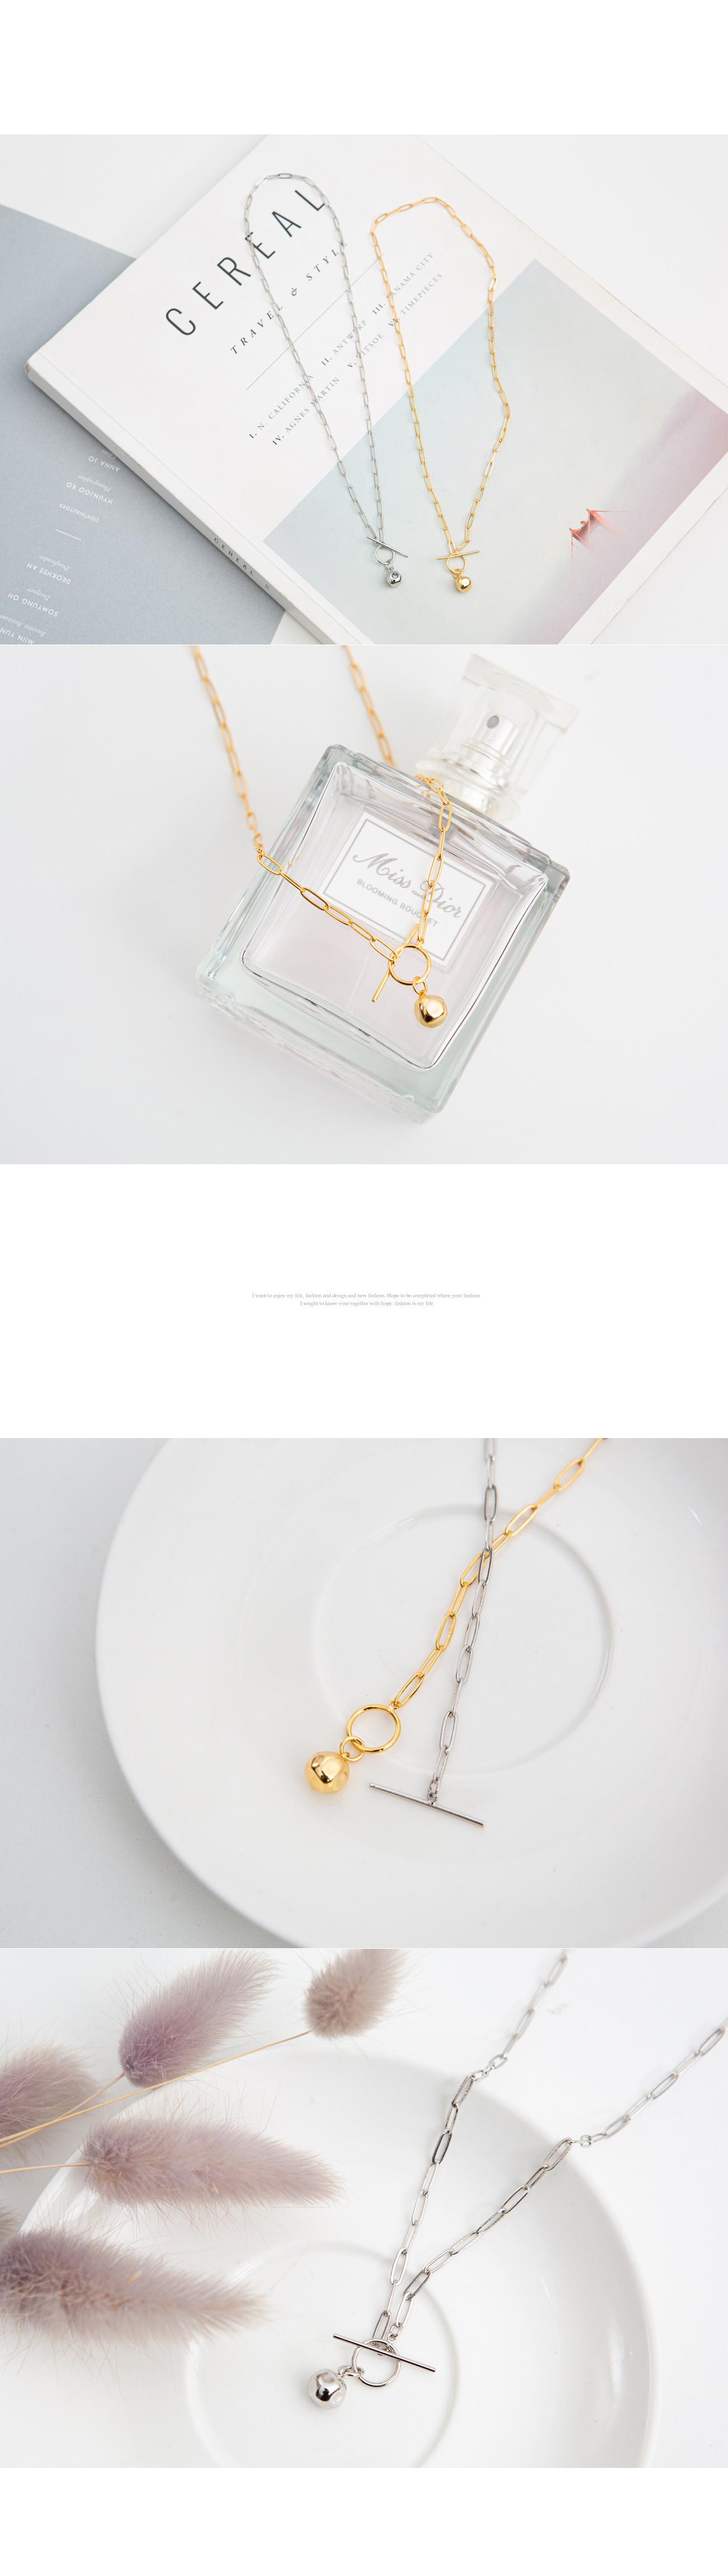 Ball square chain necklace #86123